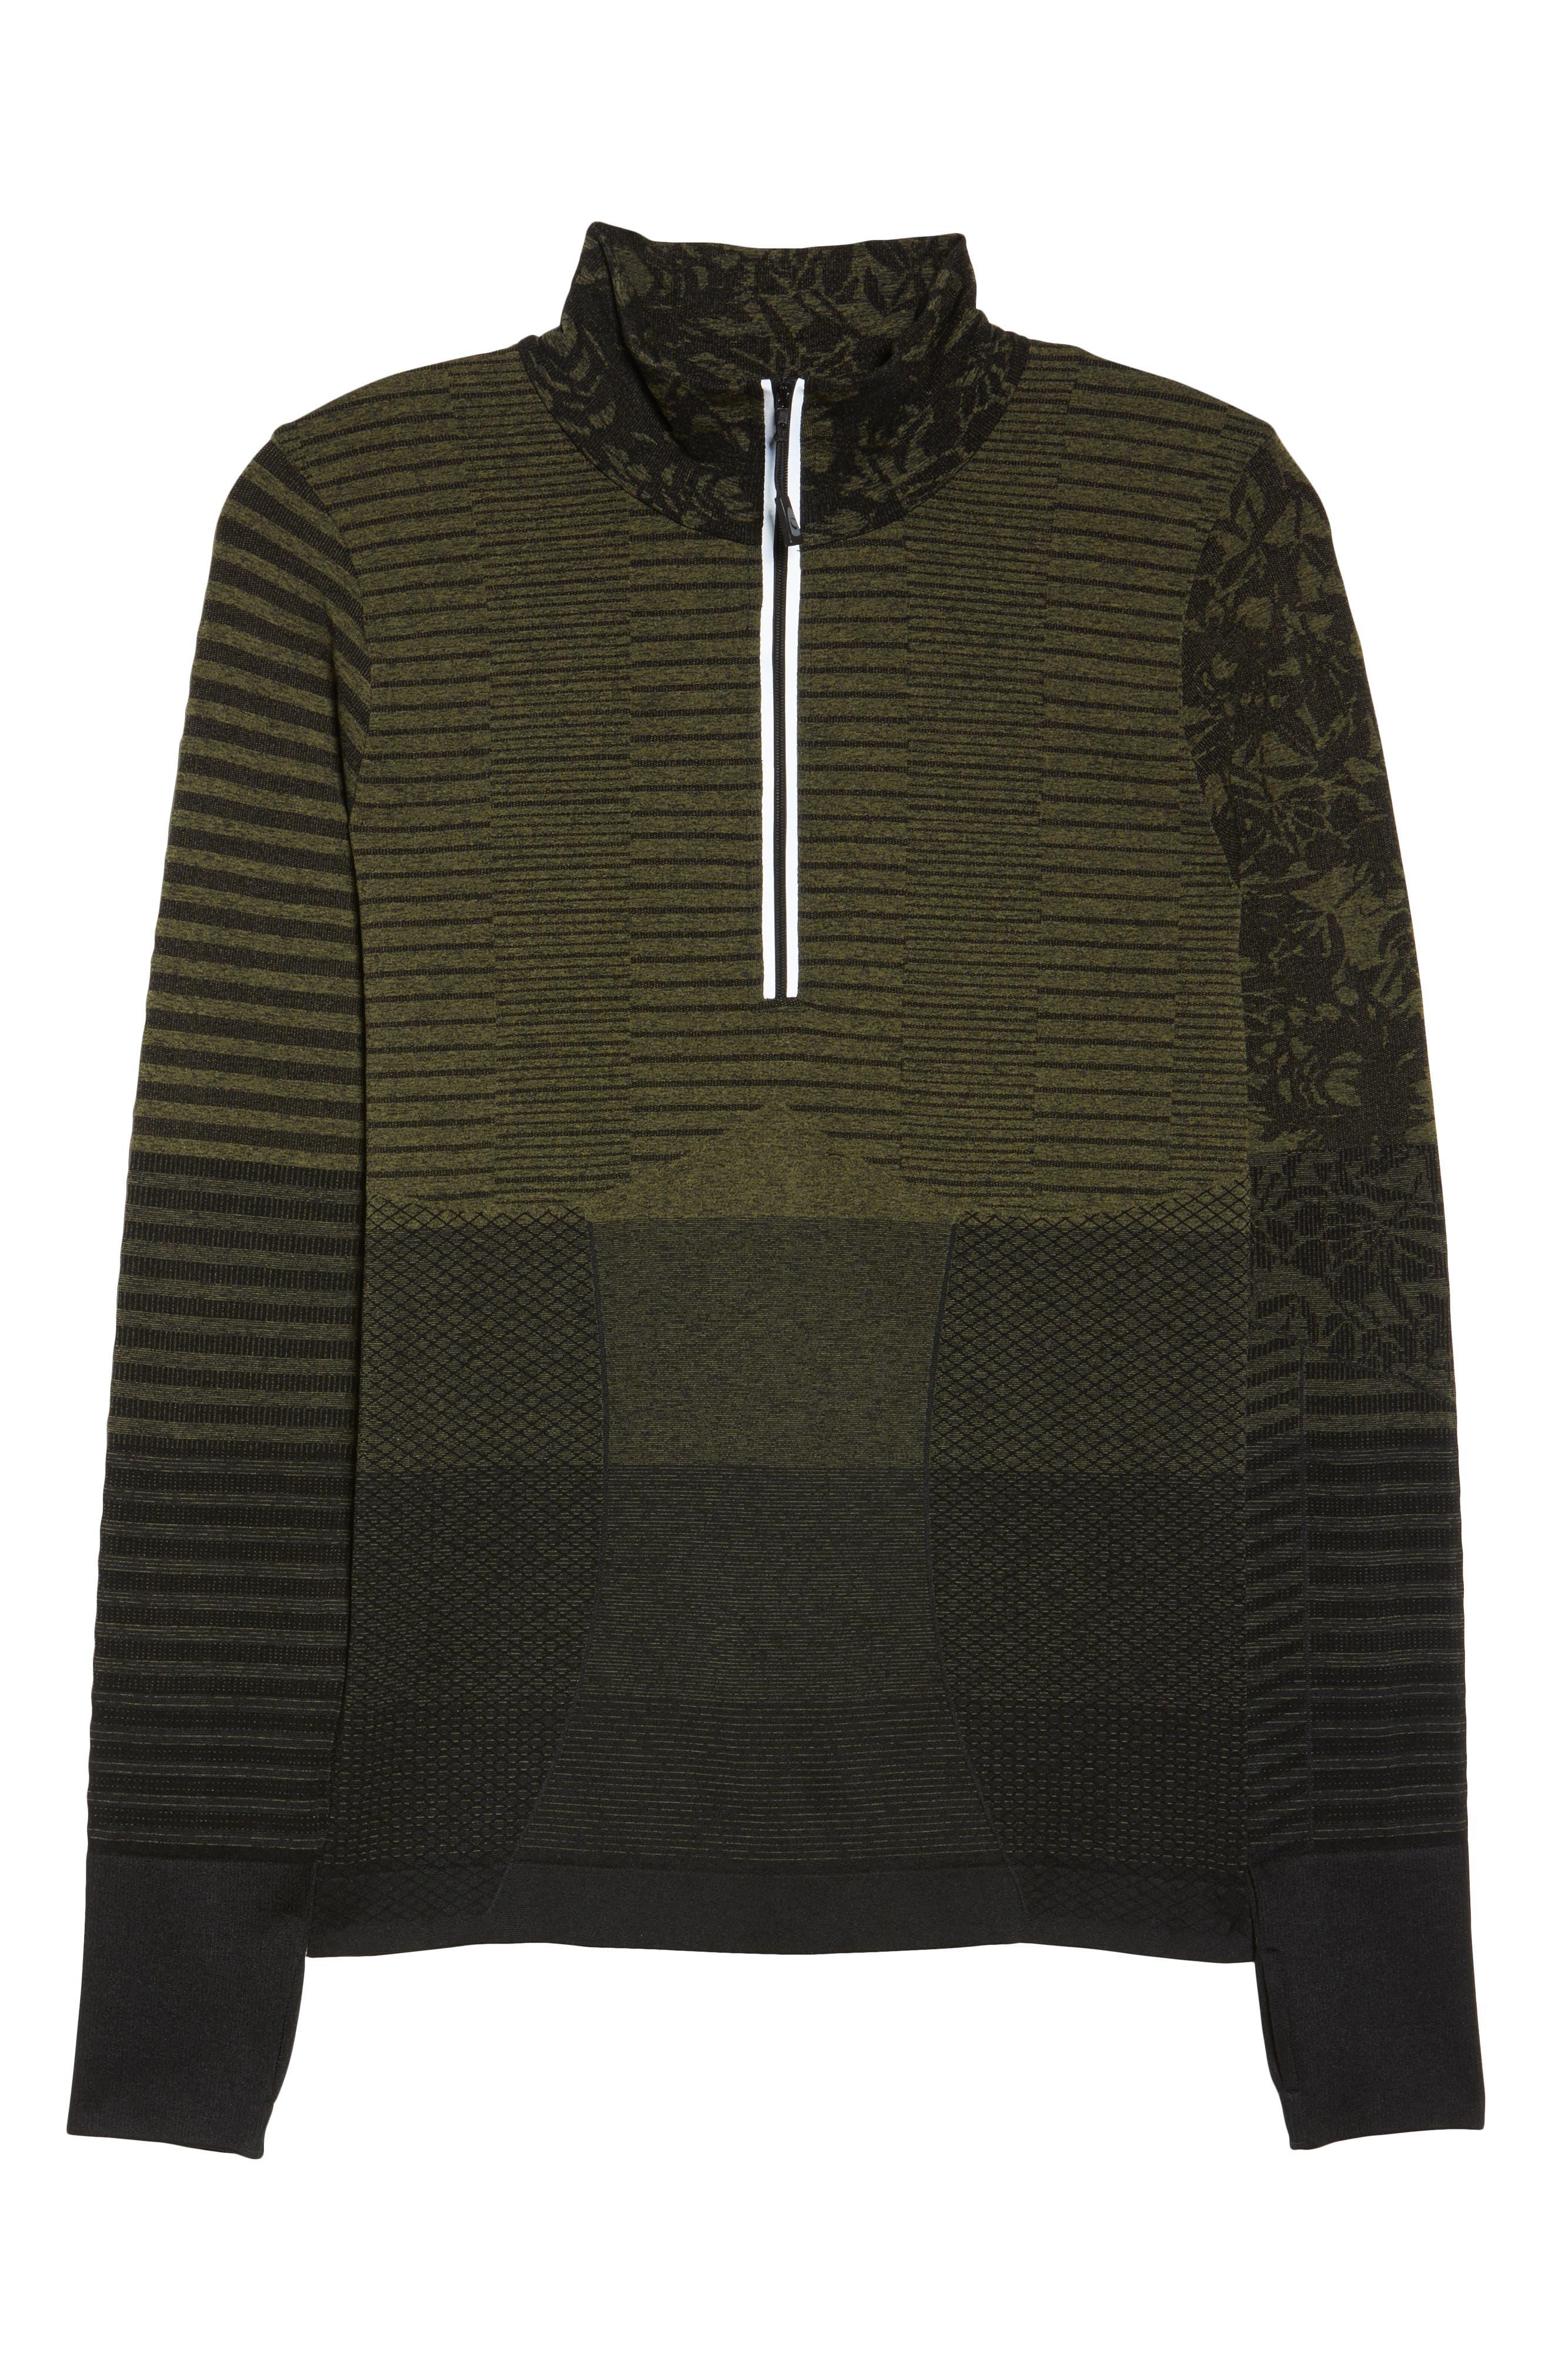 Vitality Quarter Zip Pullover,                             Alternate thumbnail 7, color,                             Deep Lichen Green/ Black